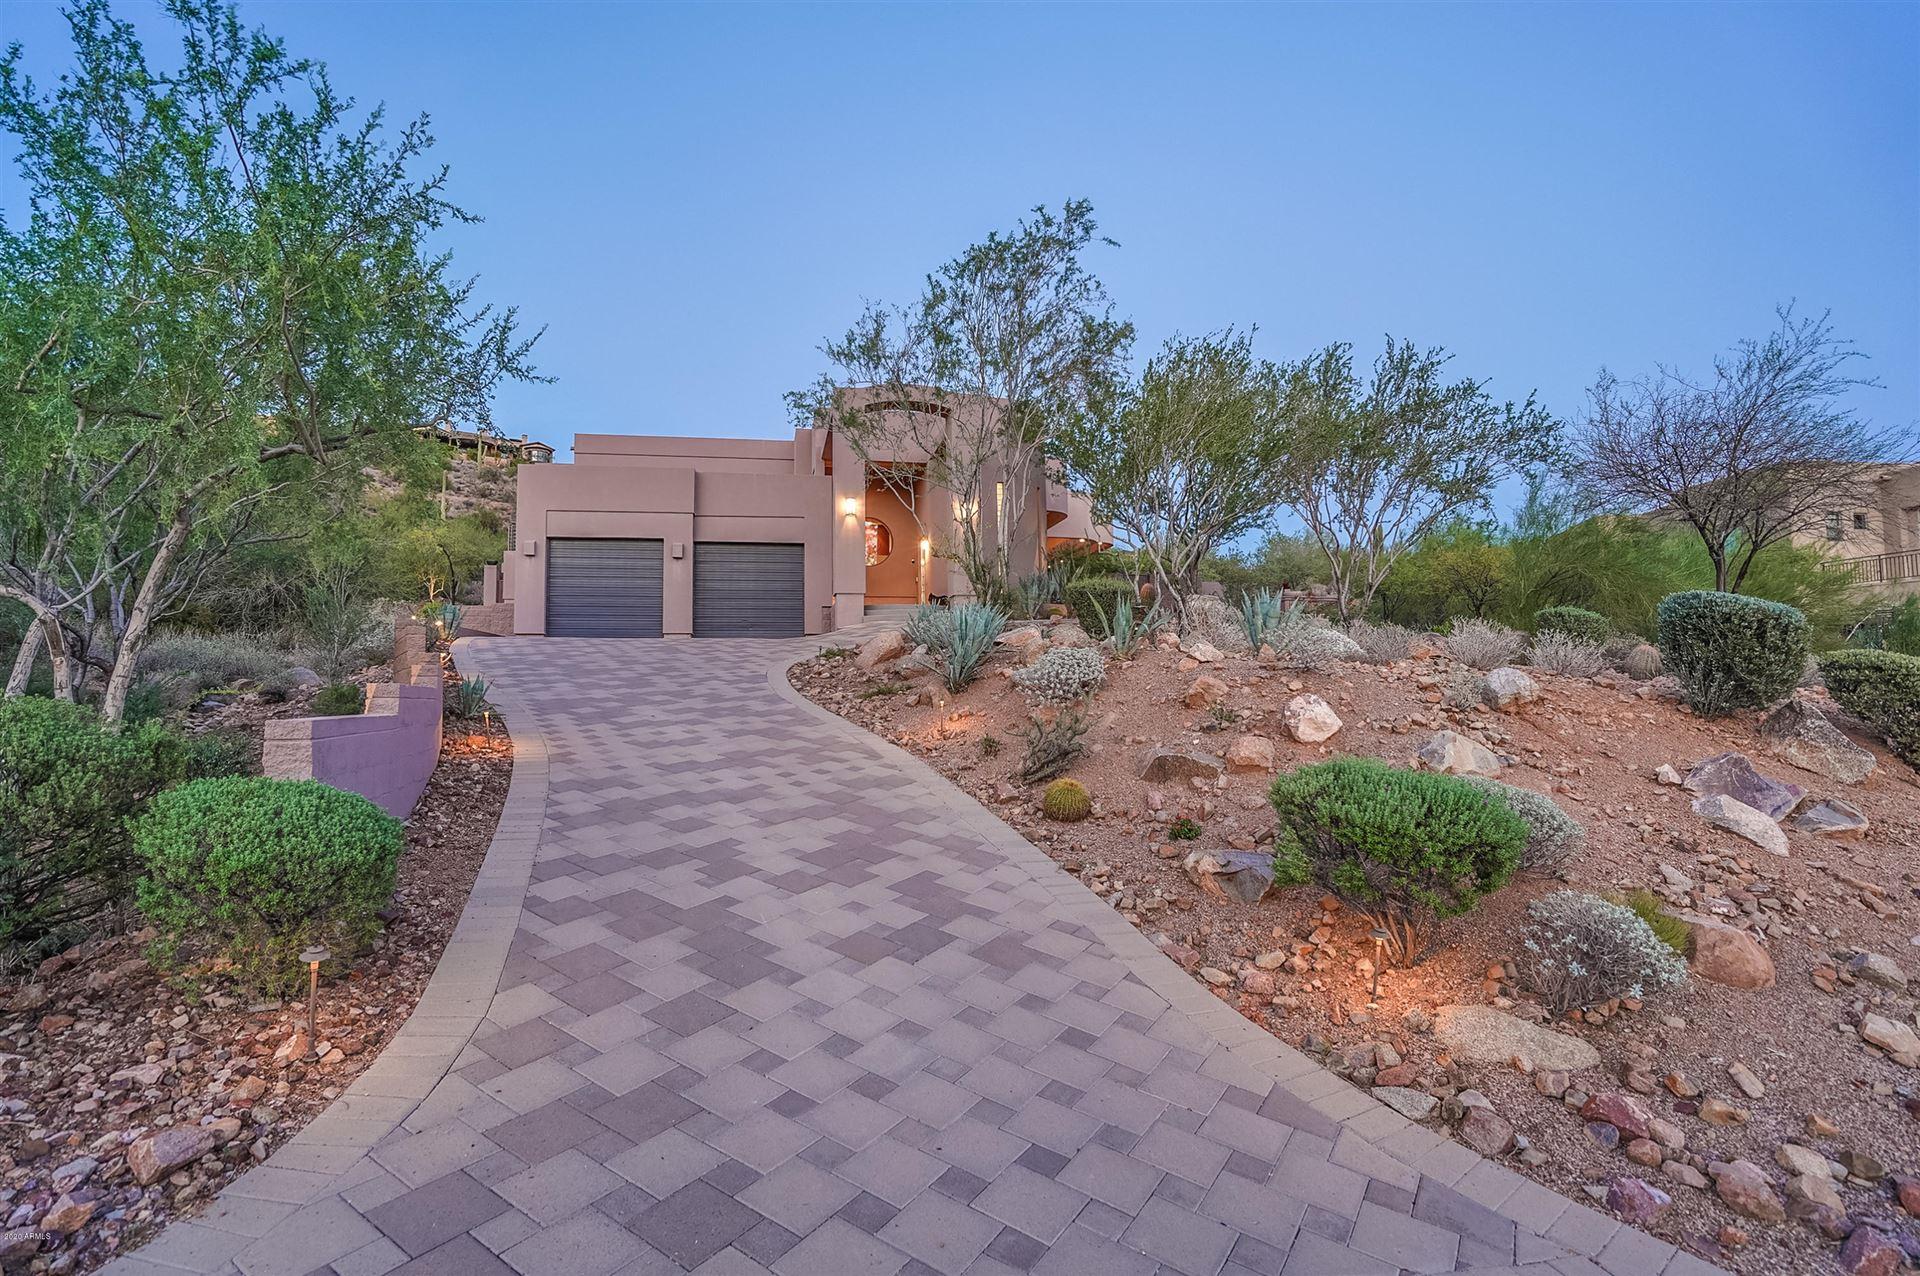 9507 N FIRERIDGE Trail, Fountain Hills, AZ 85268 - MLS#: 6091933